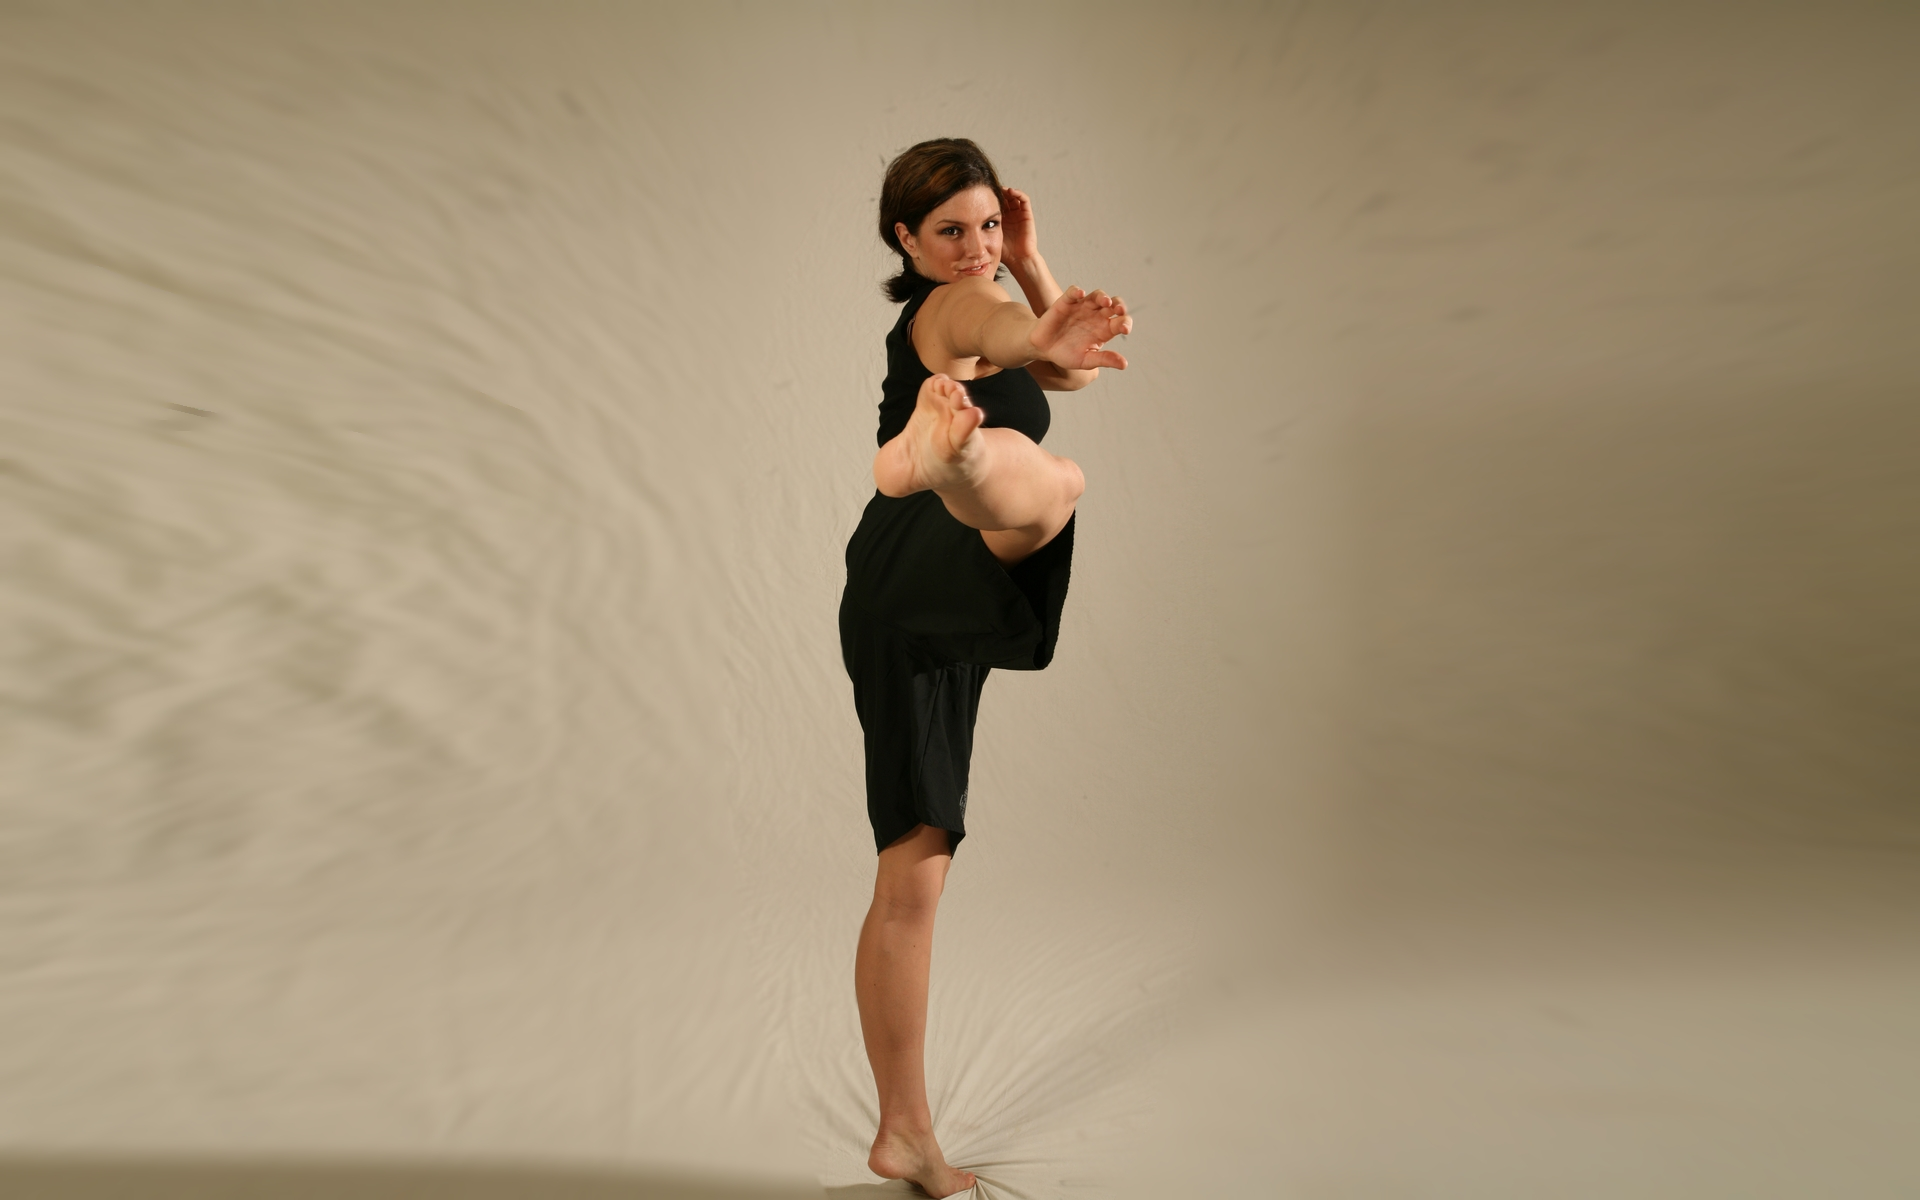 Gina Carano deportista - 1920x1200